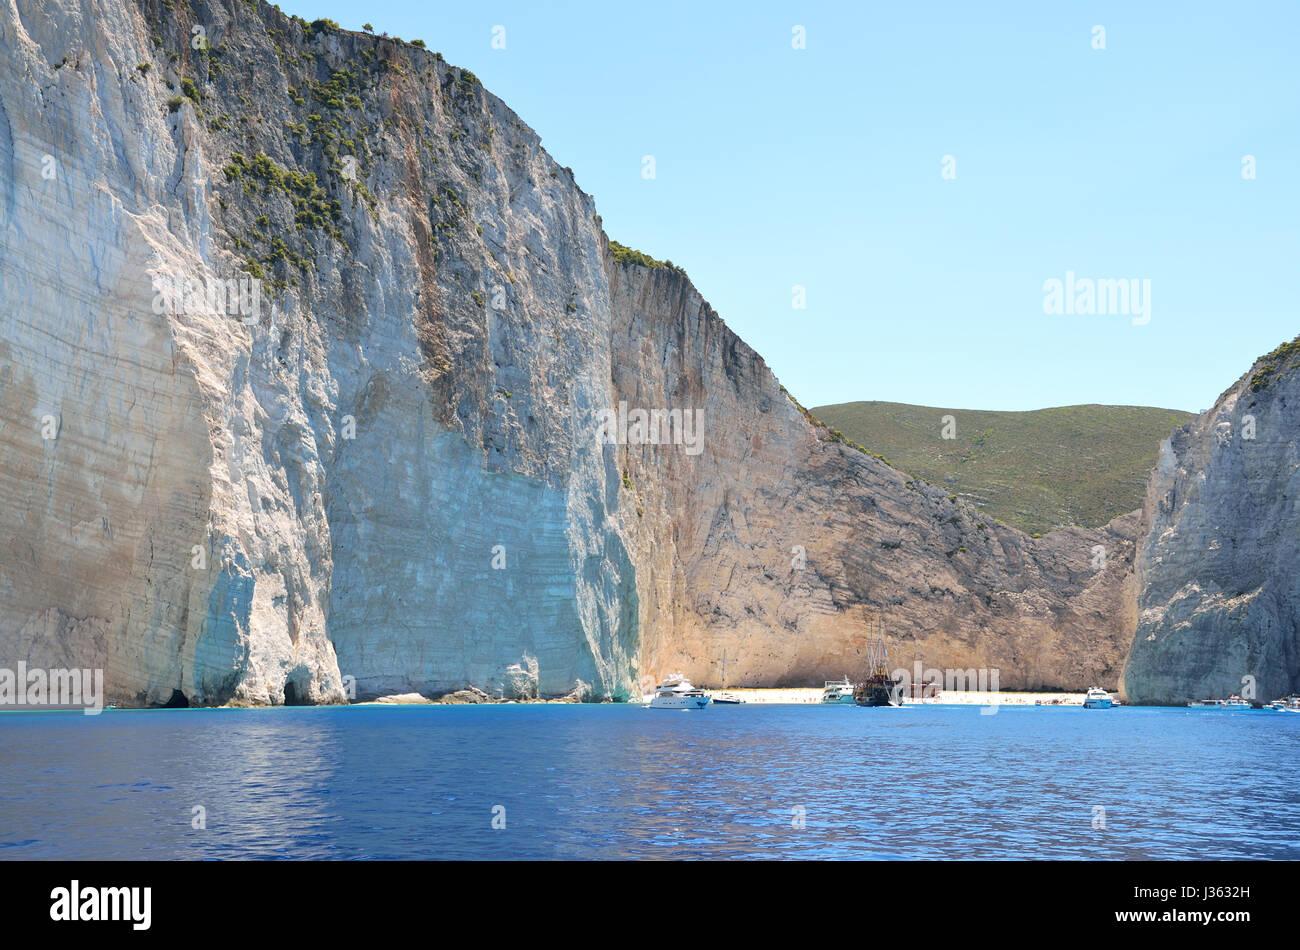 Shipwreck of Navagio beach at Zakynthos Stock Photo